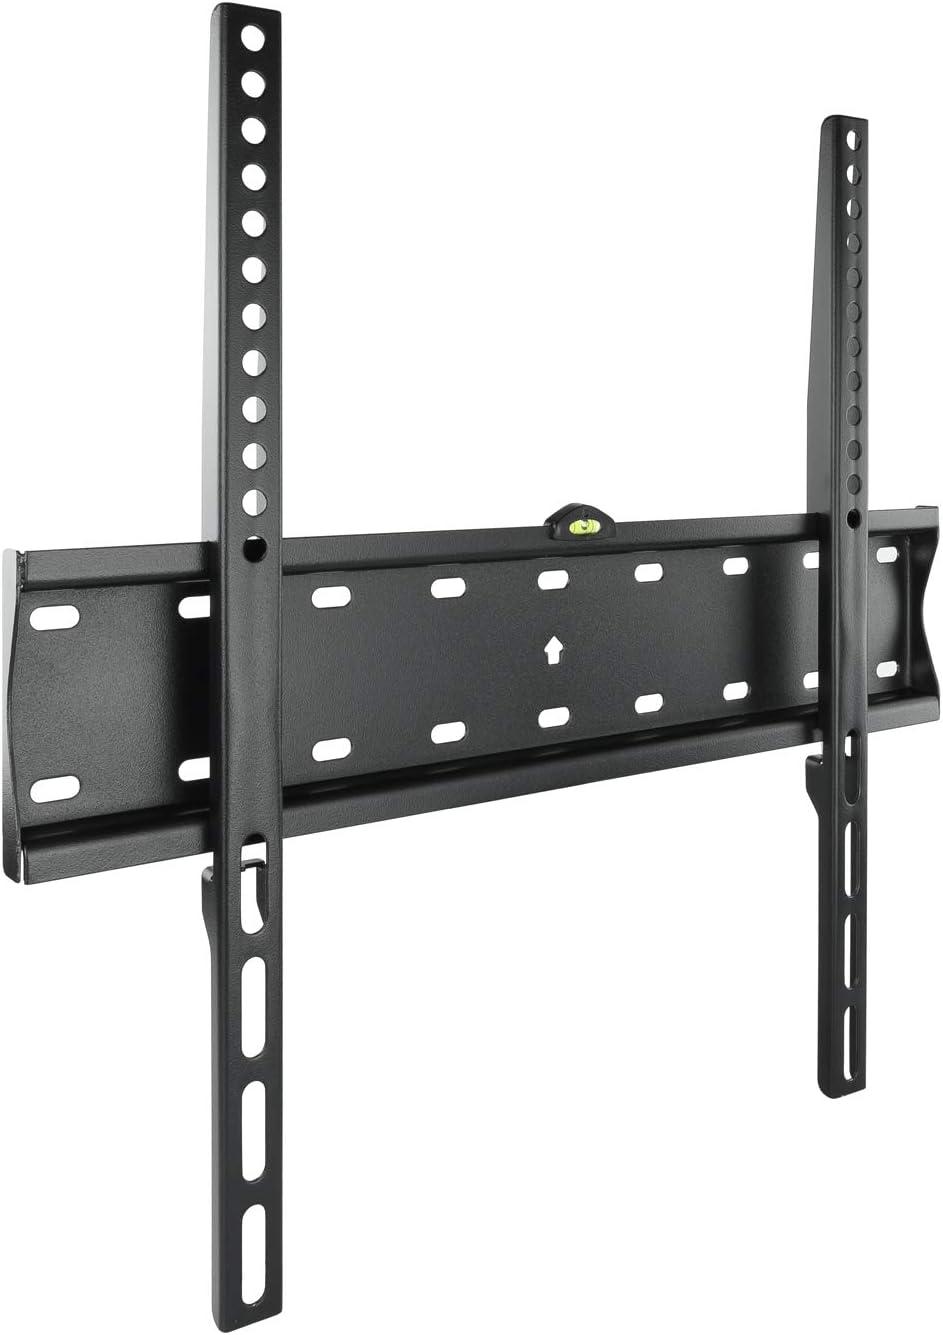 TooQ LP4155F-B, Soporte Fijo de Pared para Monitor, 1, Negro